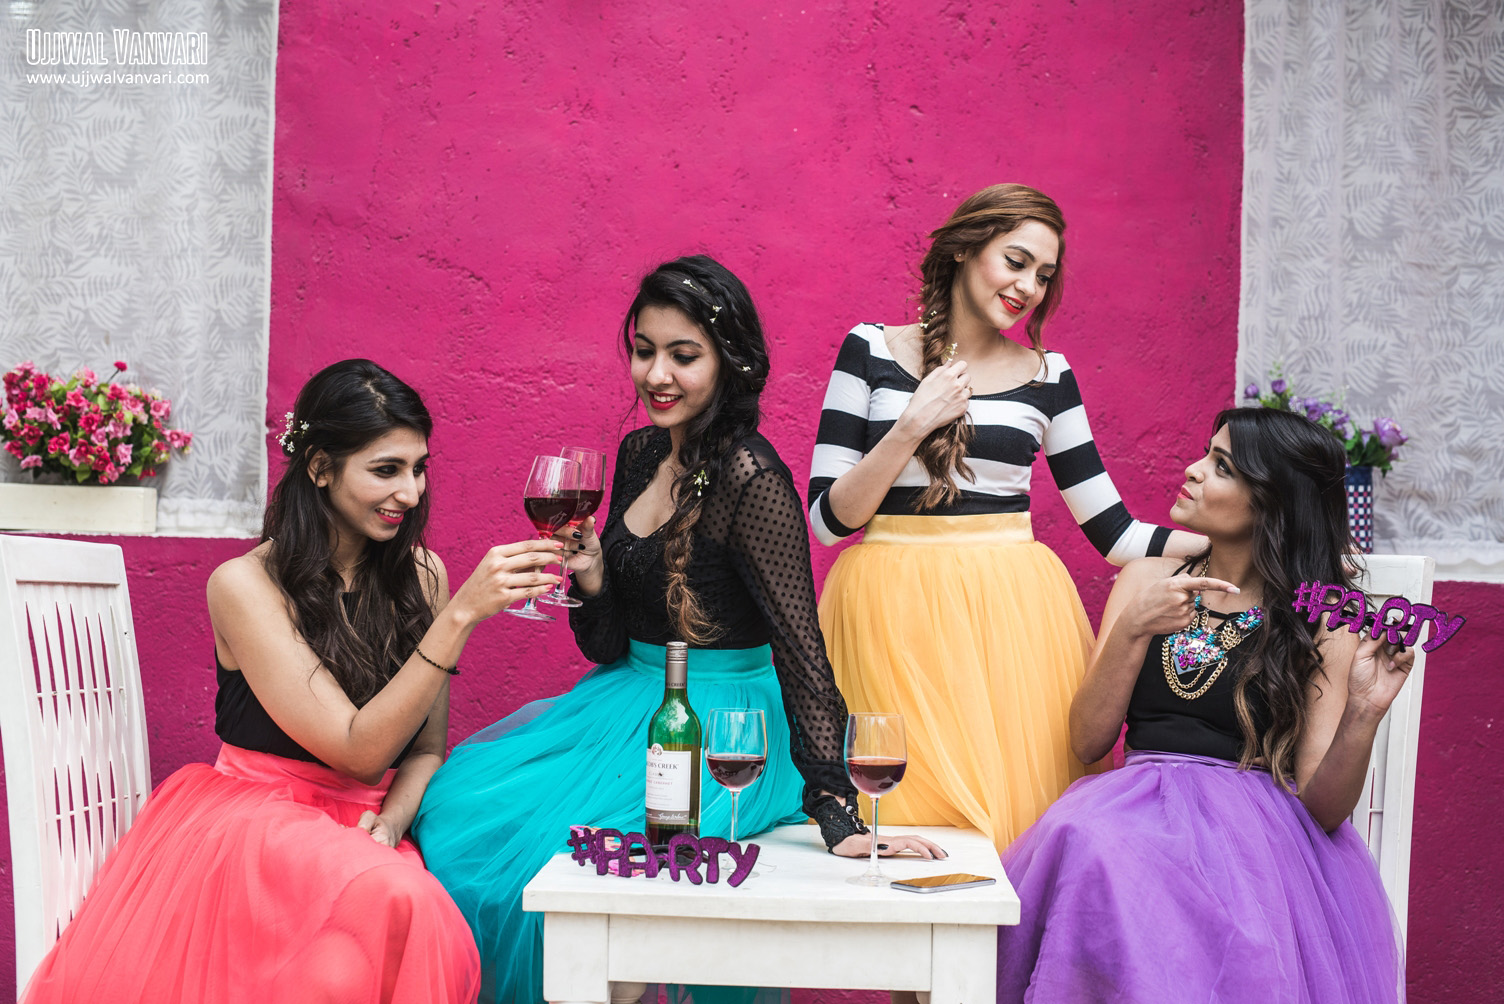 Fashion Photoshoot | the Perfect Location | Dixika Vanvari Withlovemissd Ashima Makhija Colorsnglitters Niki Mehra Nikimehra and Malveika Gupta Styleonwings